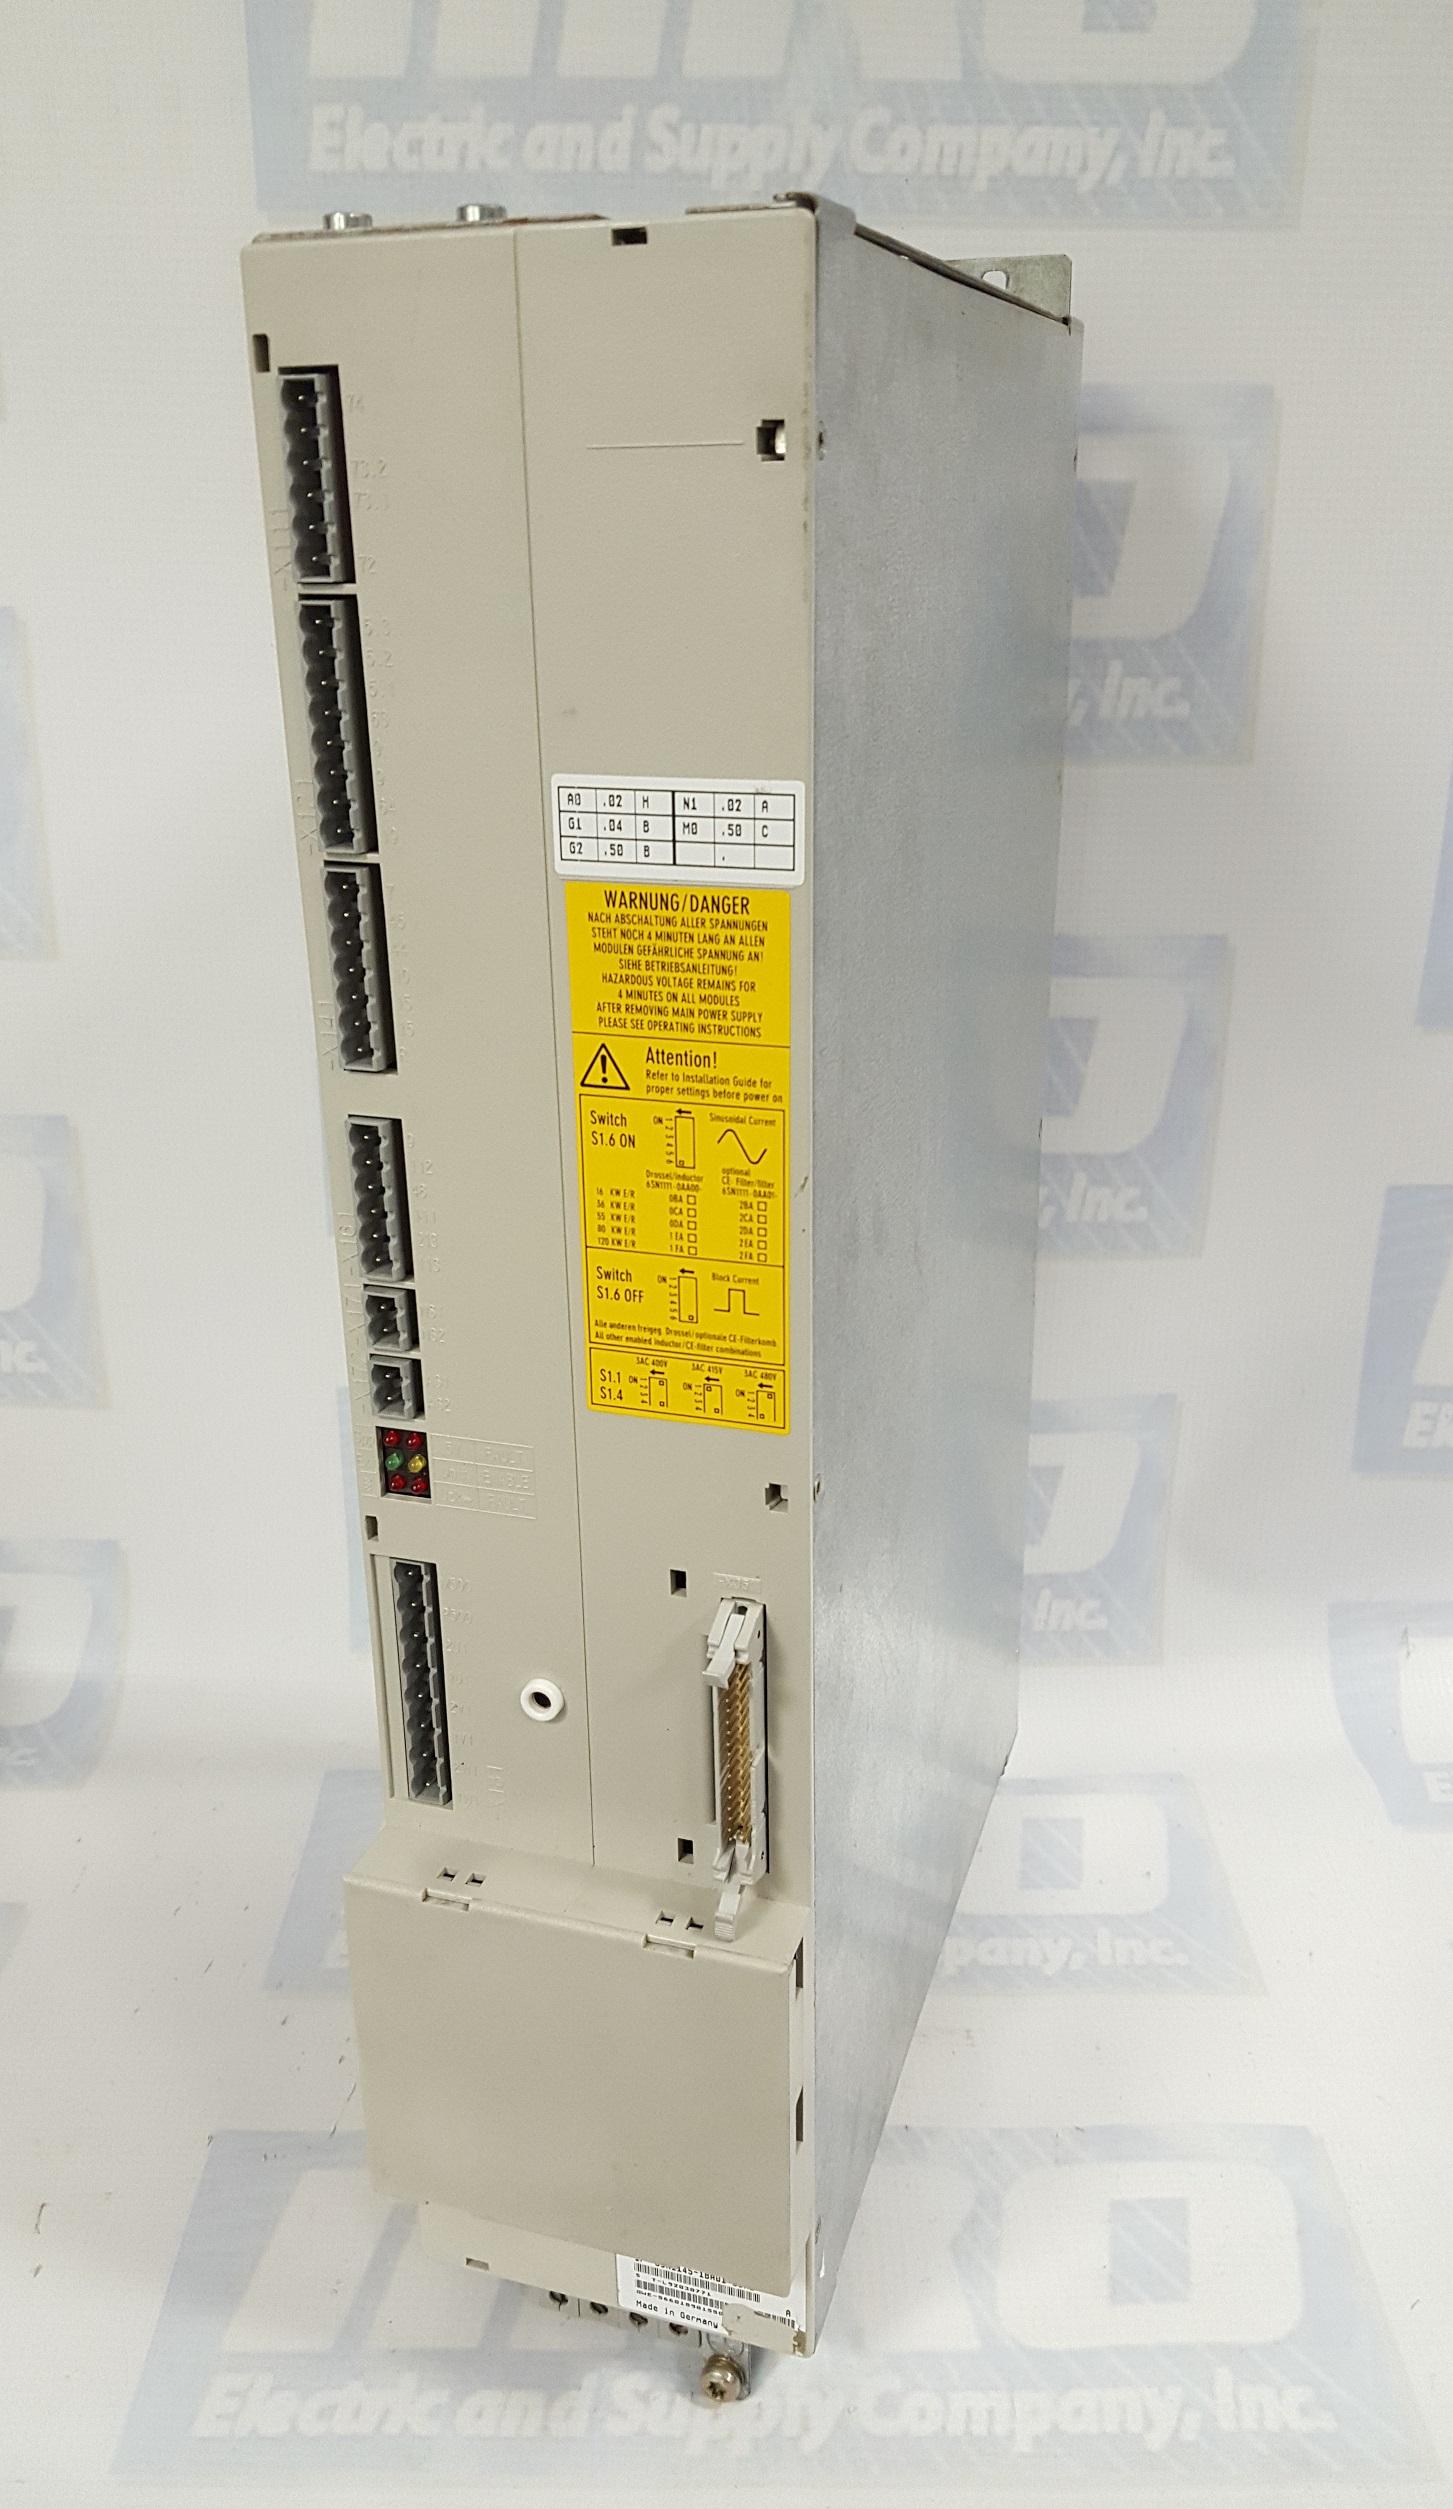 6SN1145-1BA01-0BA1